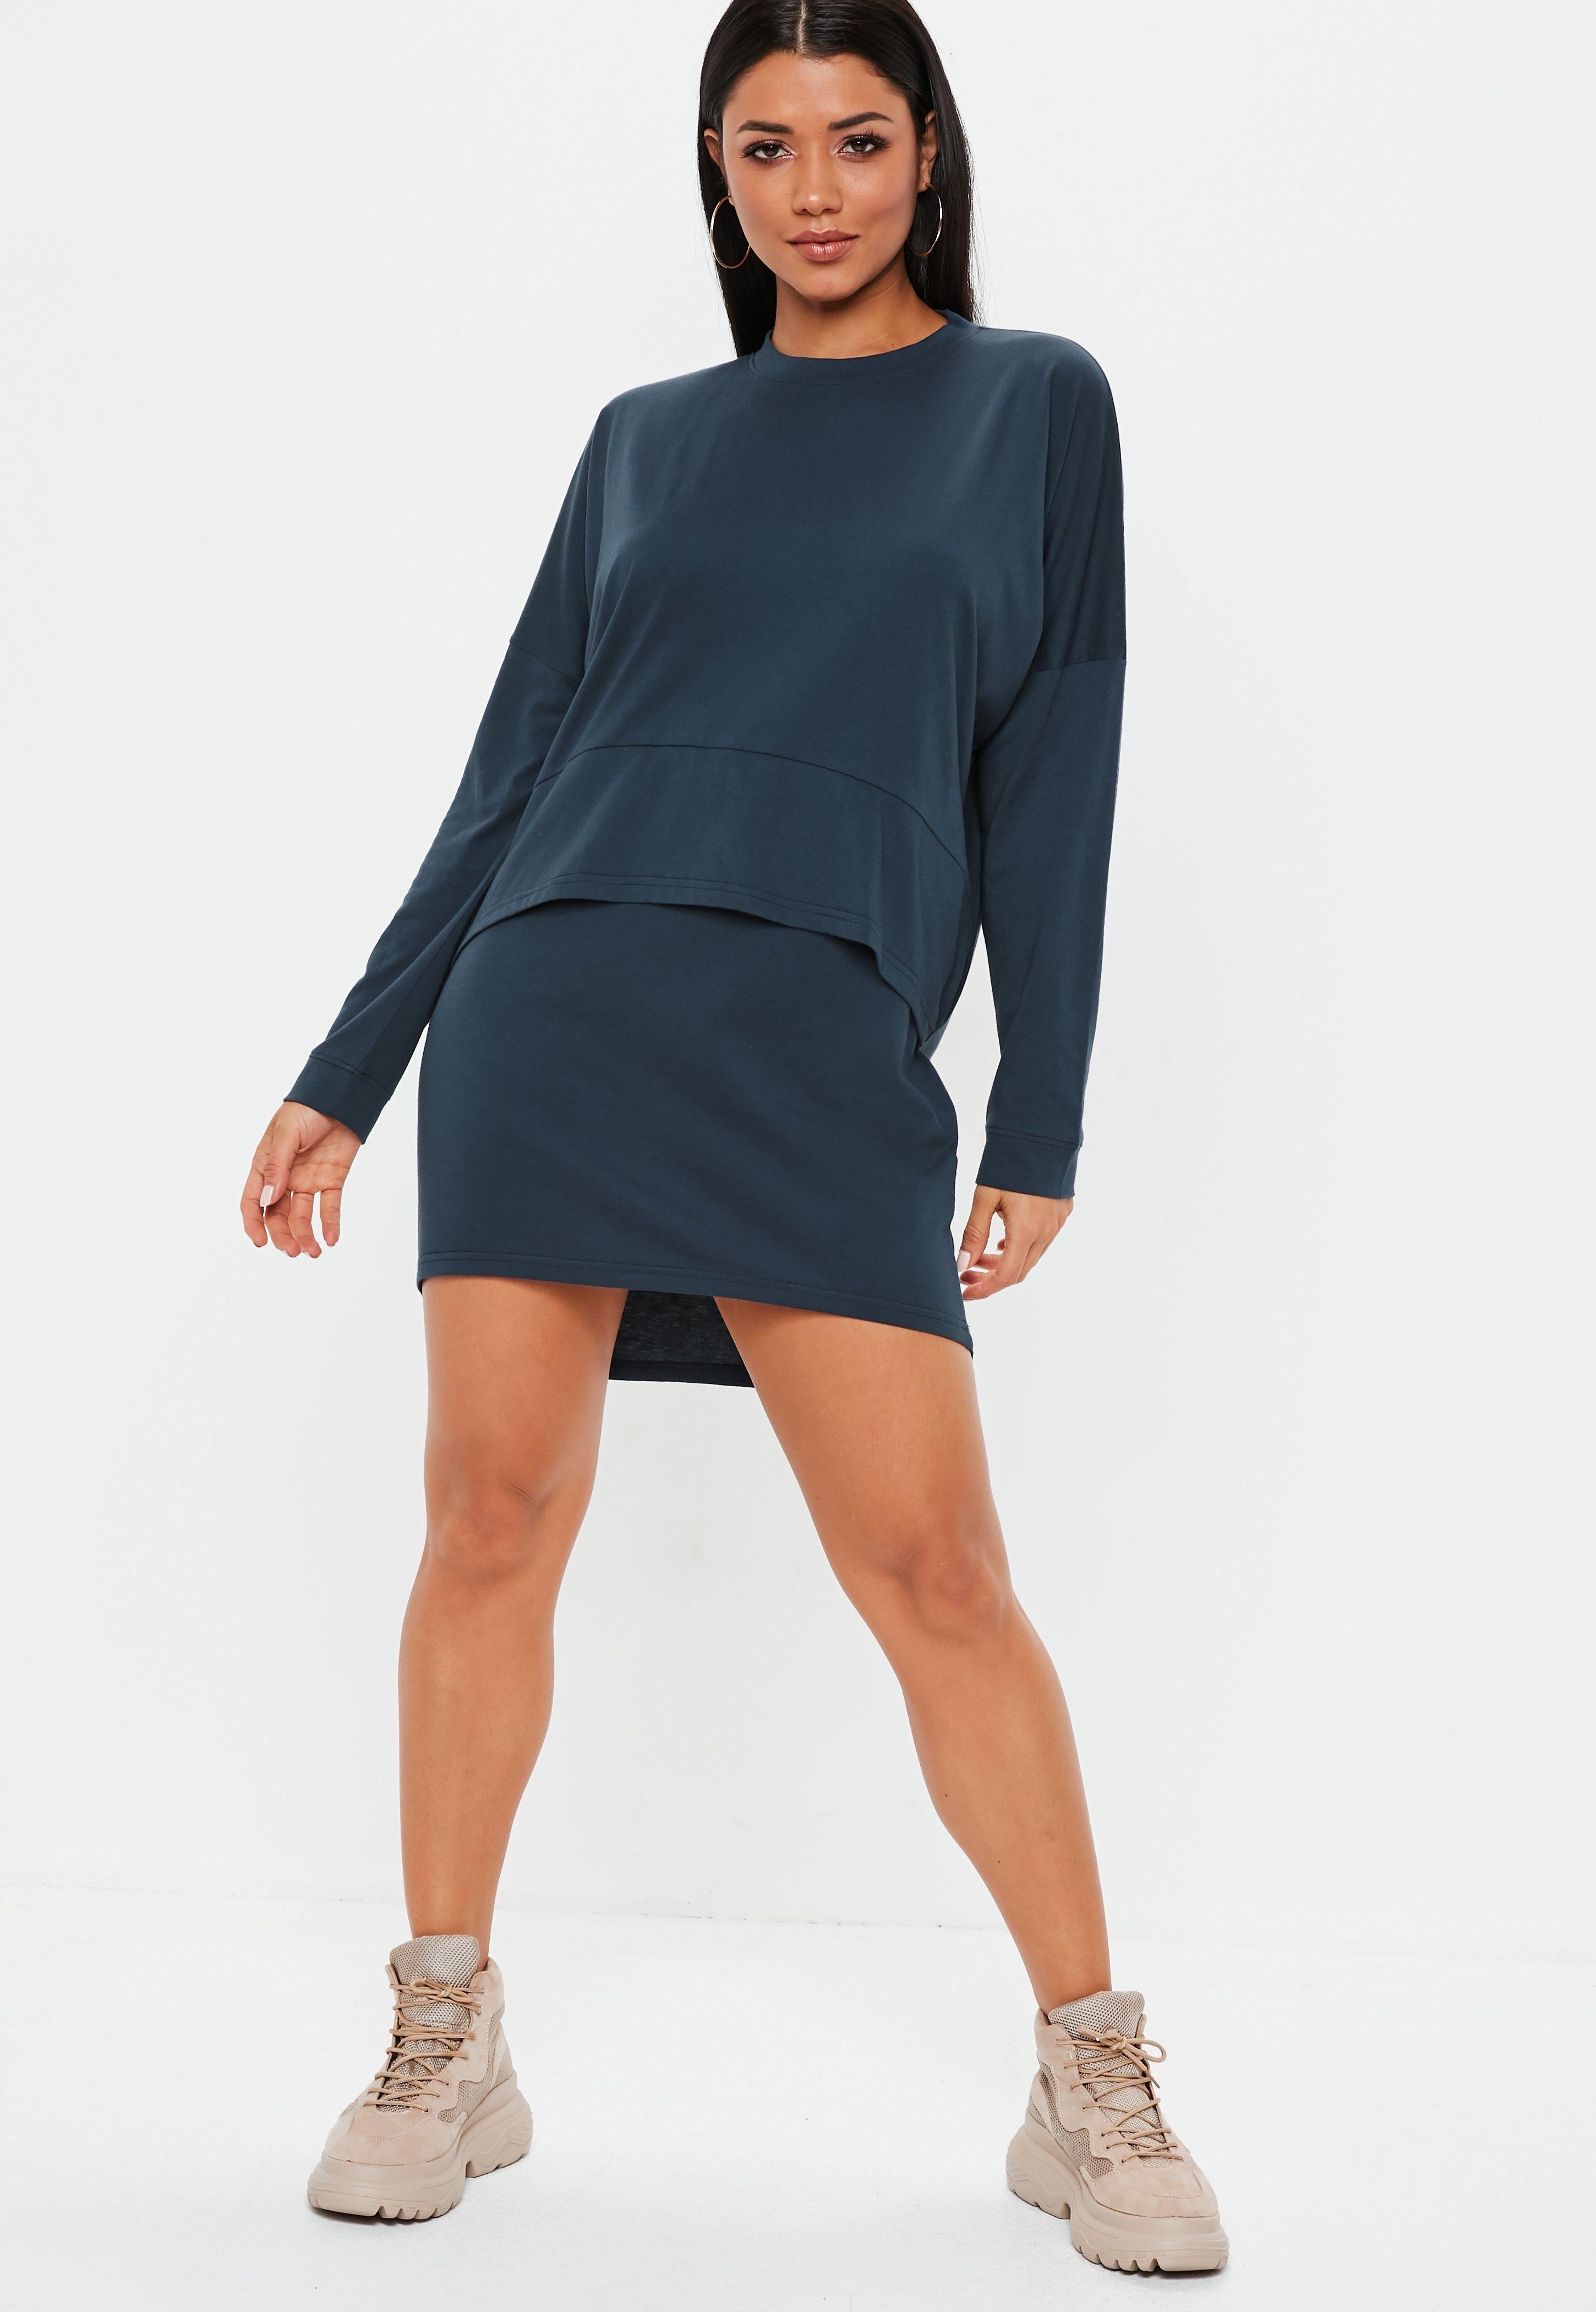 3980482f7240b Navy Oversized Jersey Overlay T Shirt Dress #Sponsored #Jersey, #ad, #